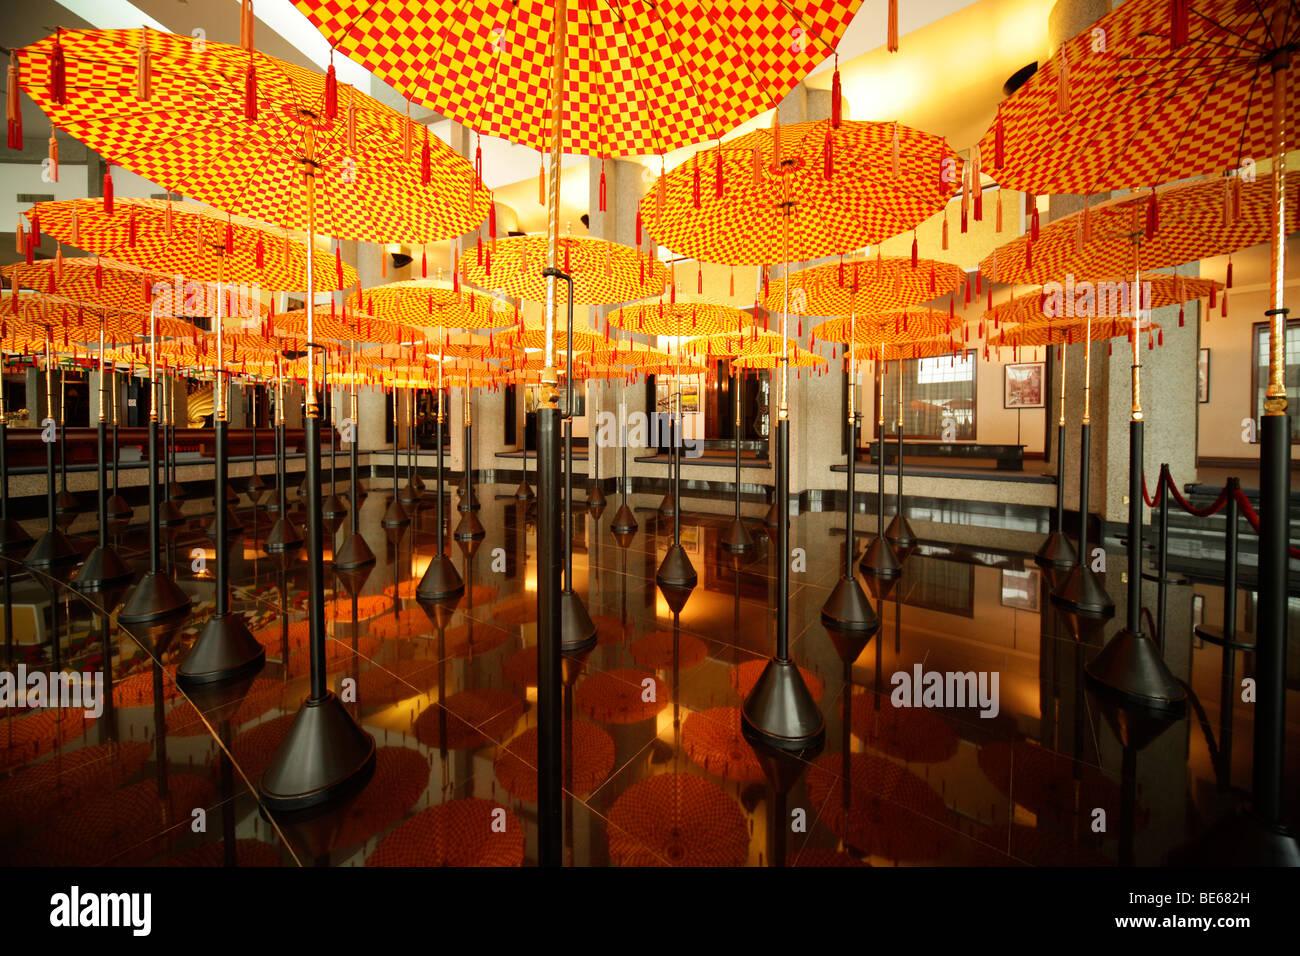 Umbrellas in the Royal Treasury, Royal Regalia Museum in the capital city, Bandar Seri Begawan, Brunei, Asia - Stock Image